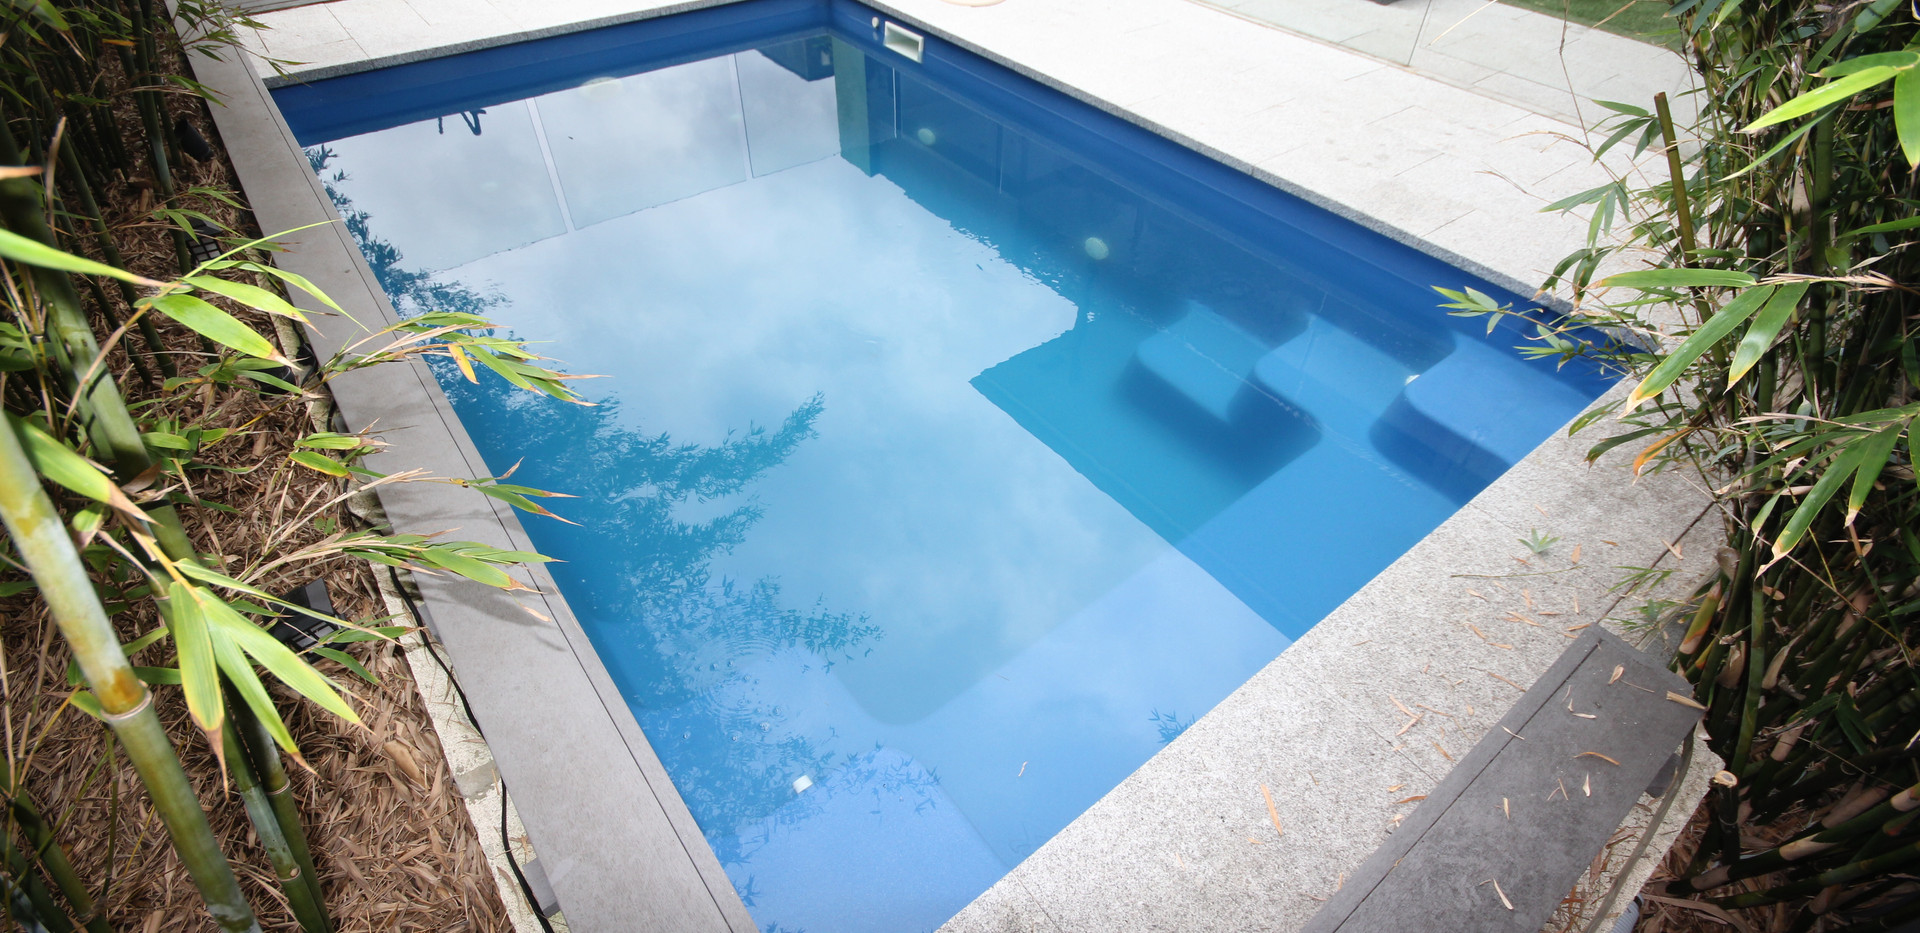 Serenity Pool by Greenwest.JPG